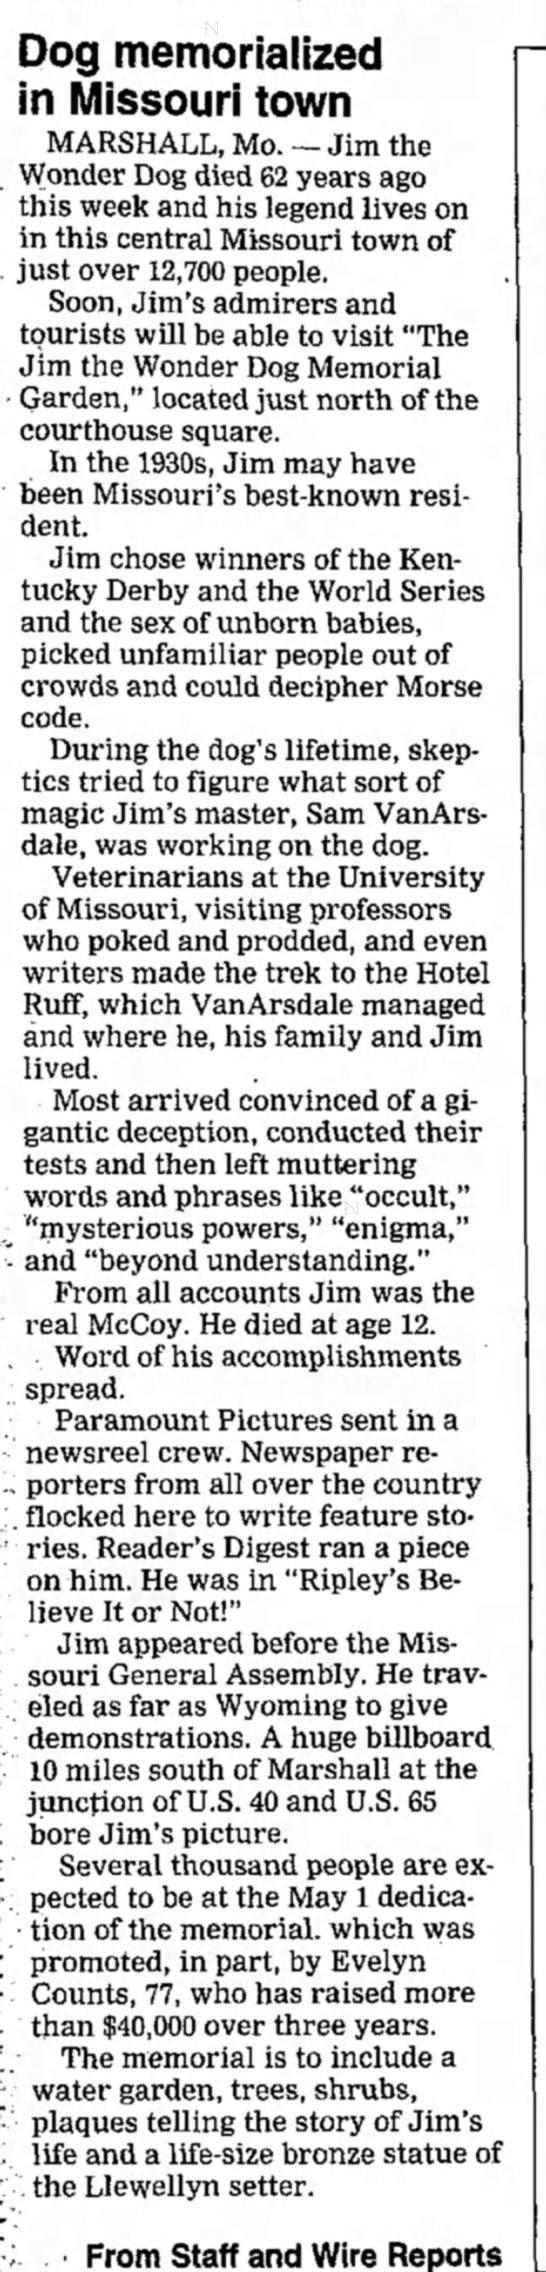 jim memorial - Dog memorialized in Missouri town MARSHALL, Mo....